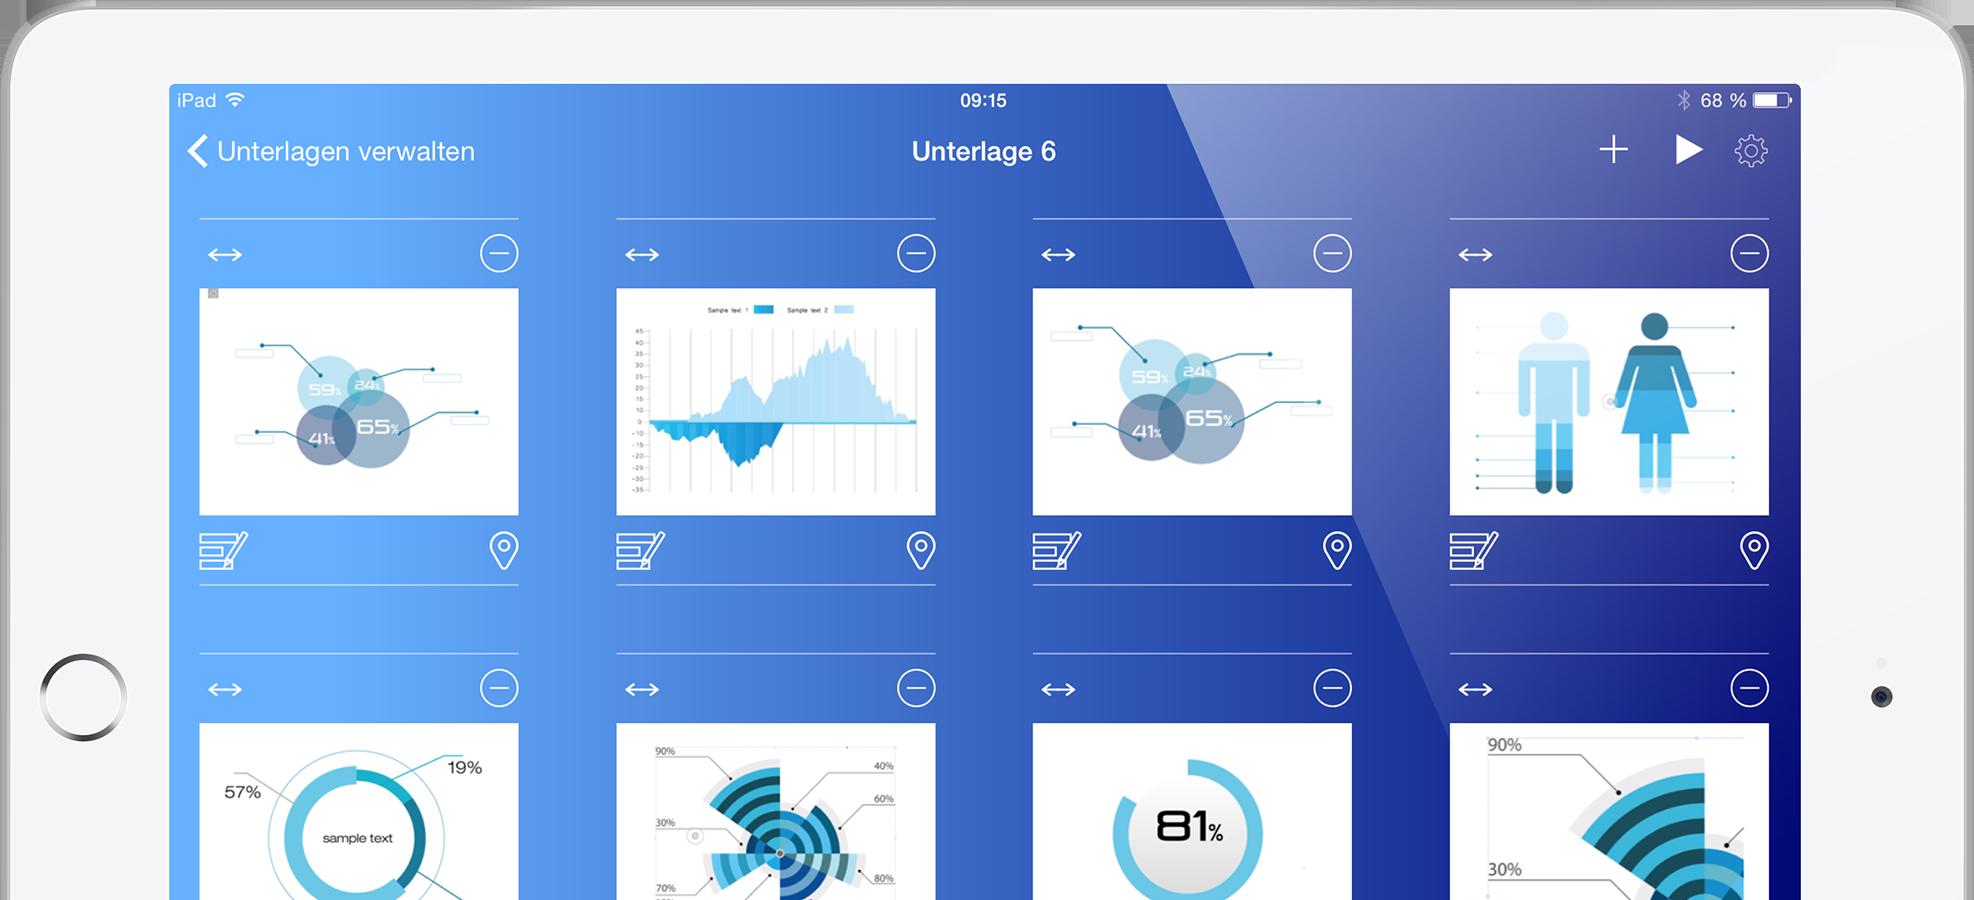 The T5 Sales Force App